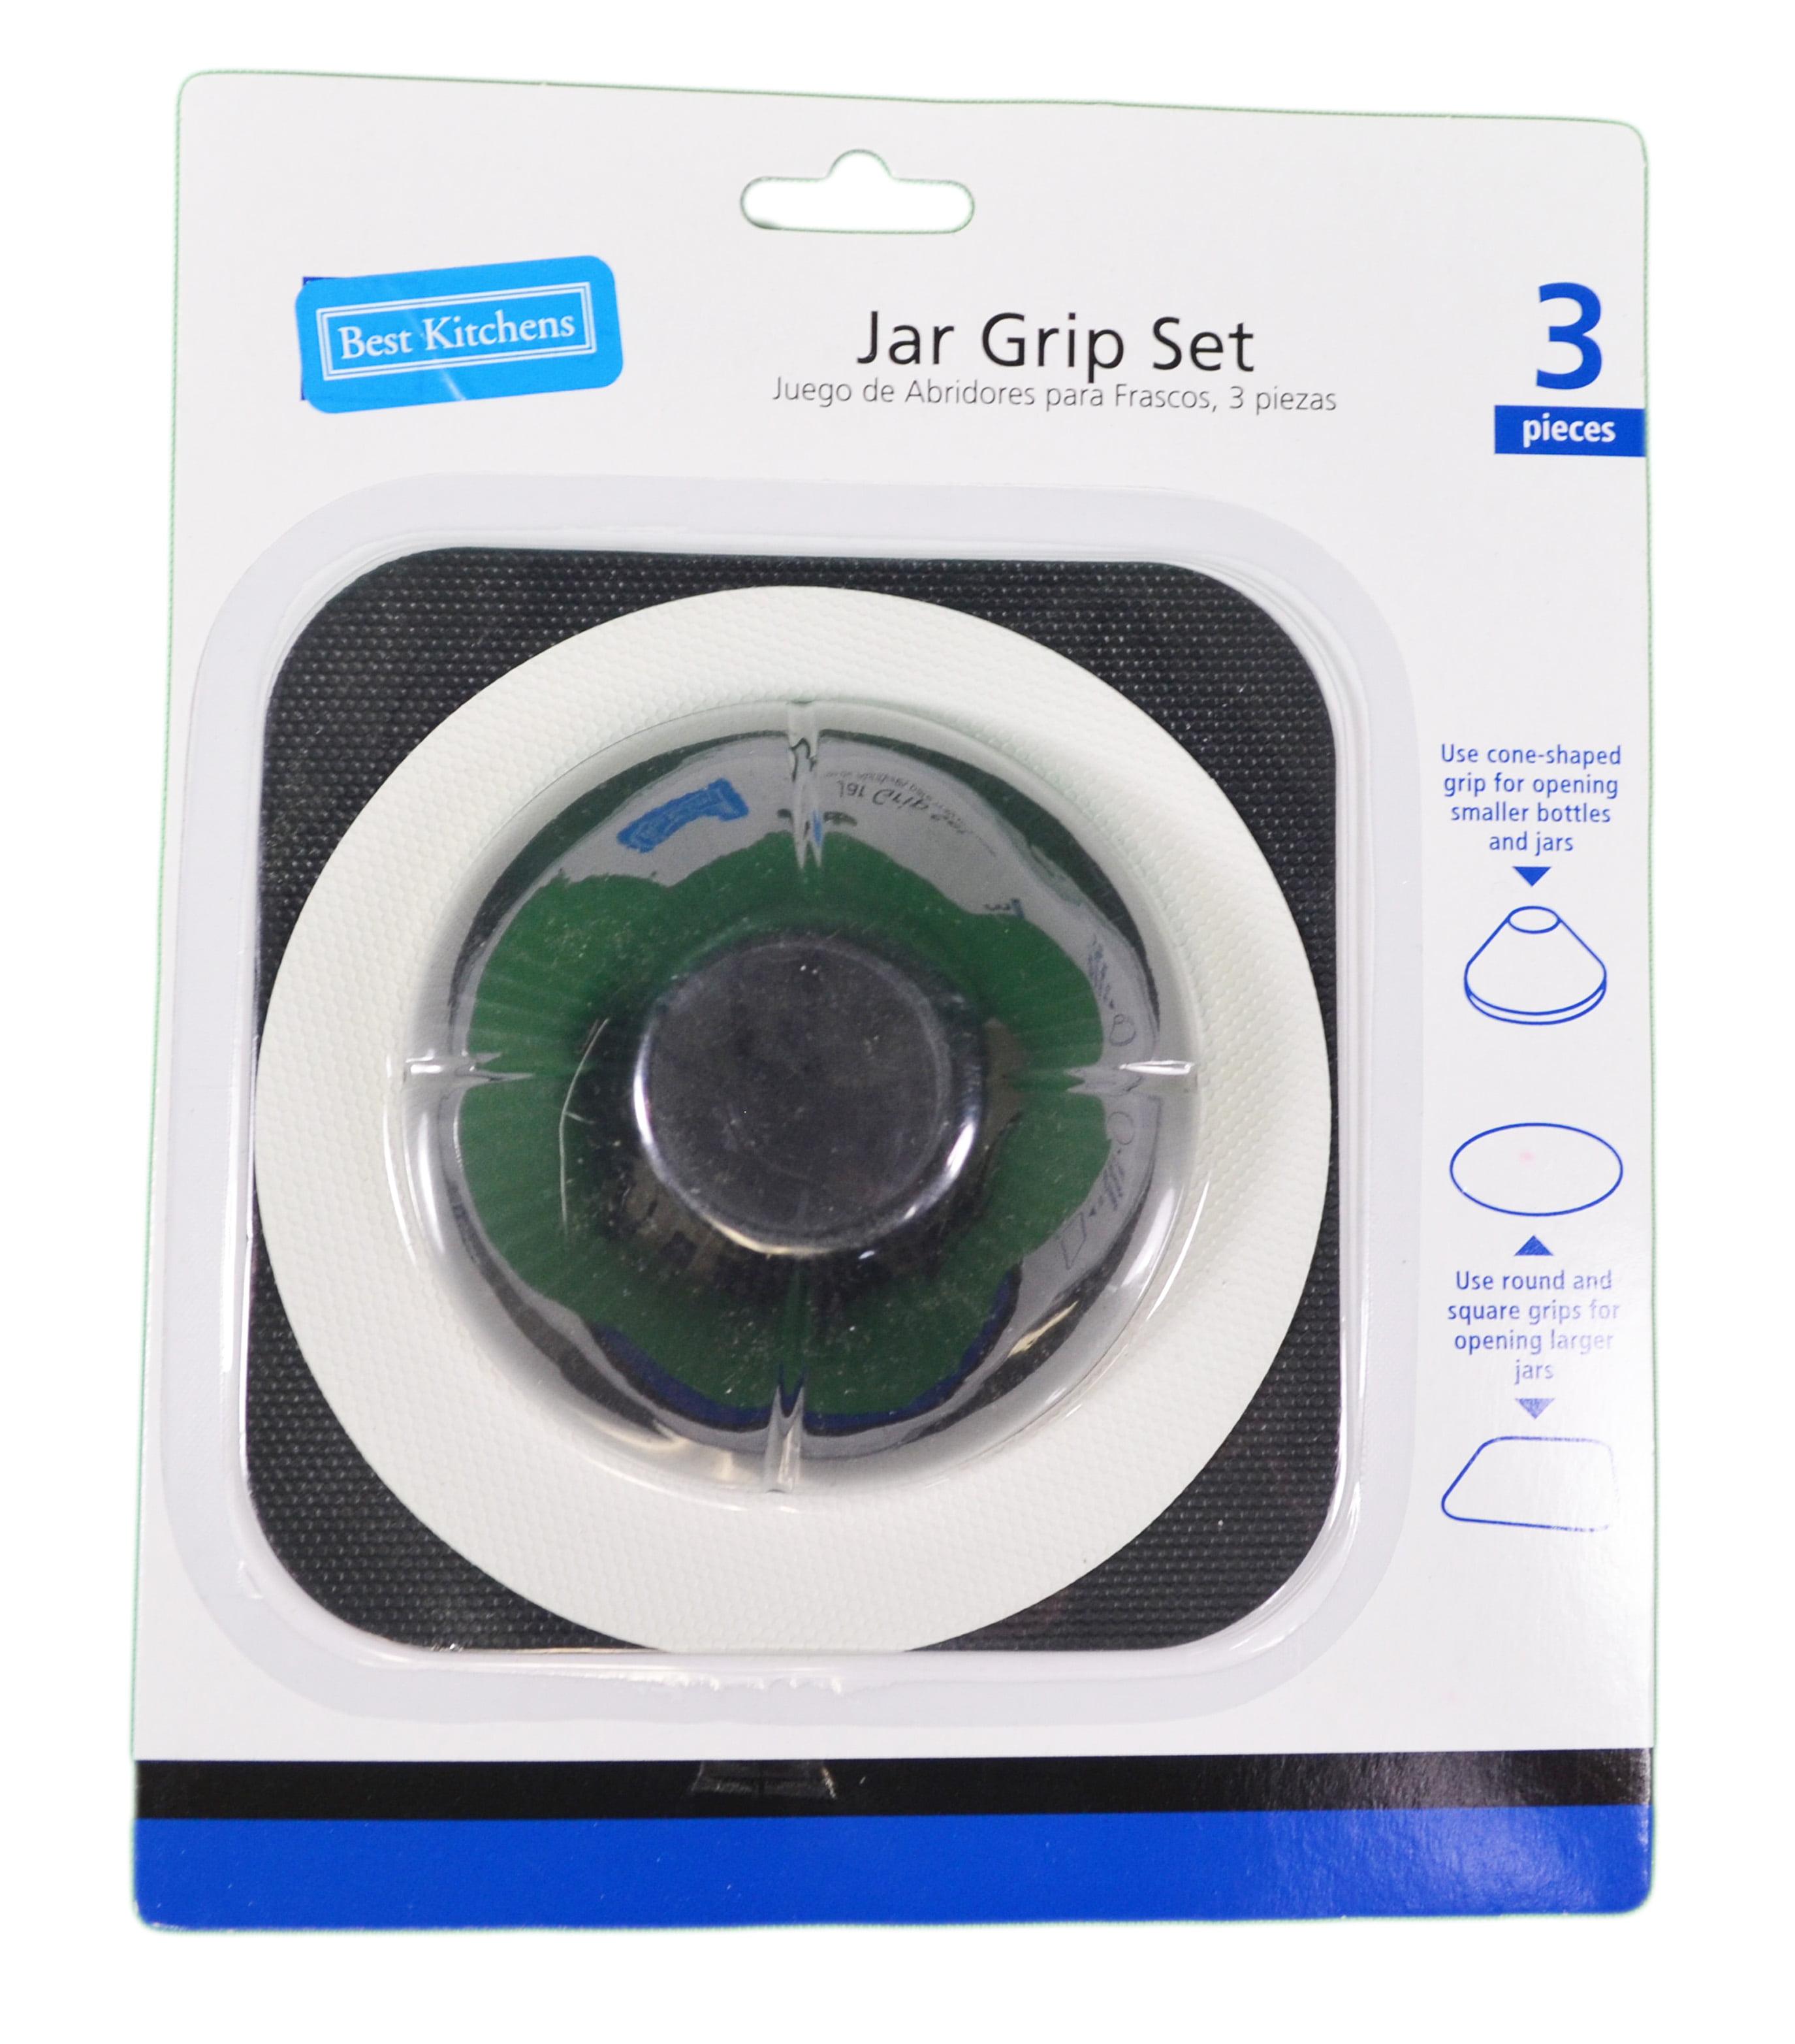 3 Piece Jar Grip Set Rubber Bottle Openers Multi Purpose Non Slip Grippers by